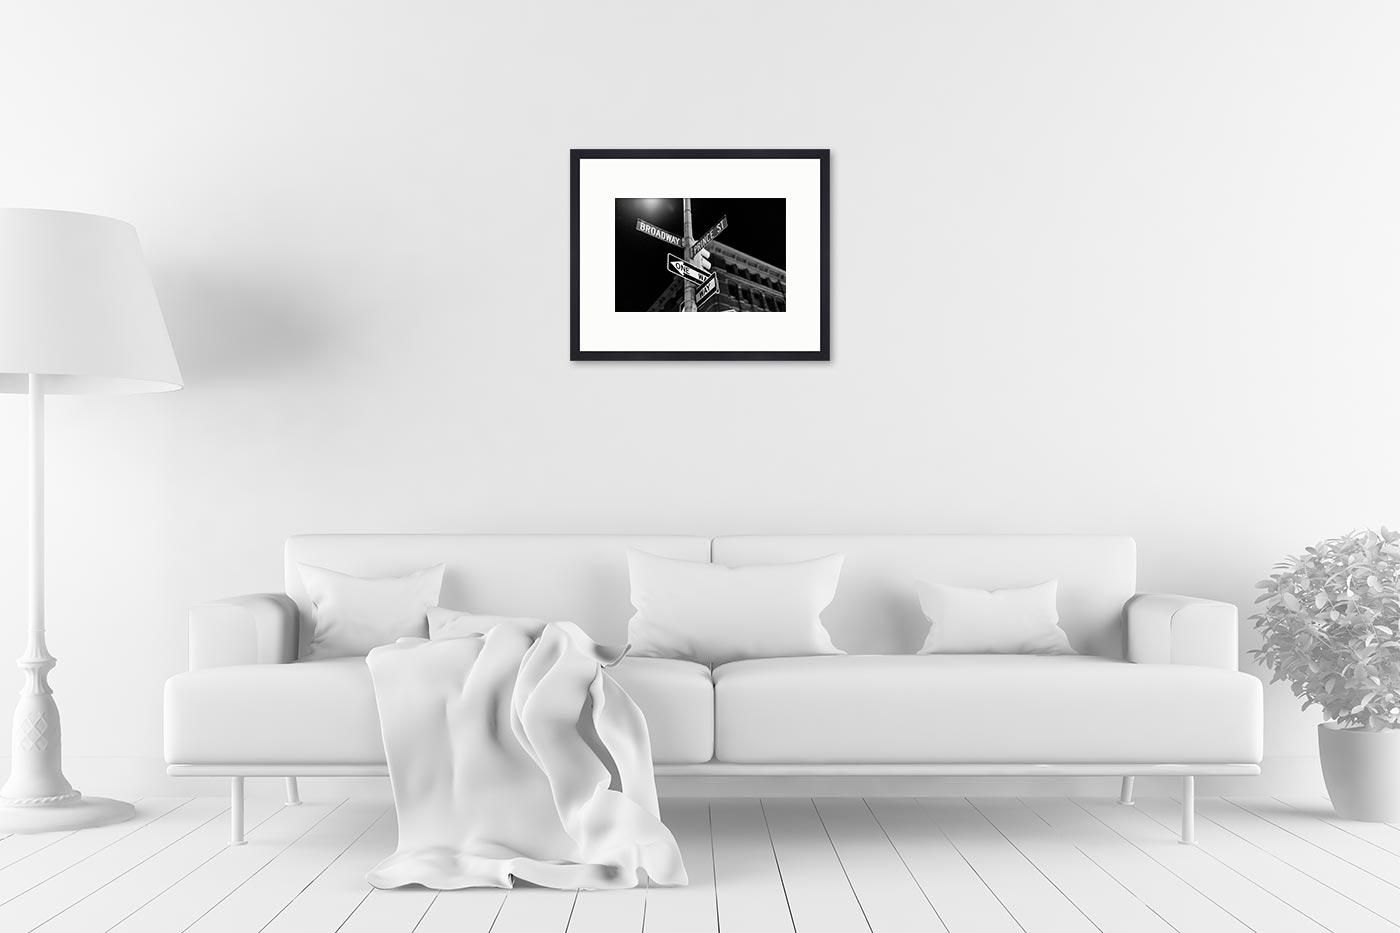 Cadre galerie 40x50 One Way